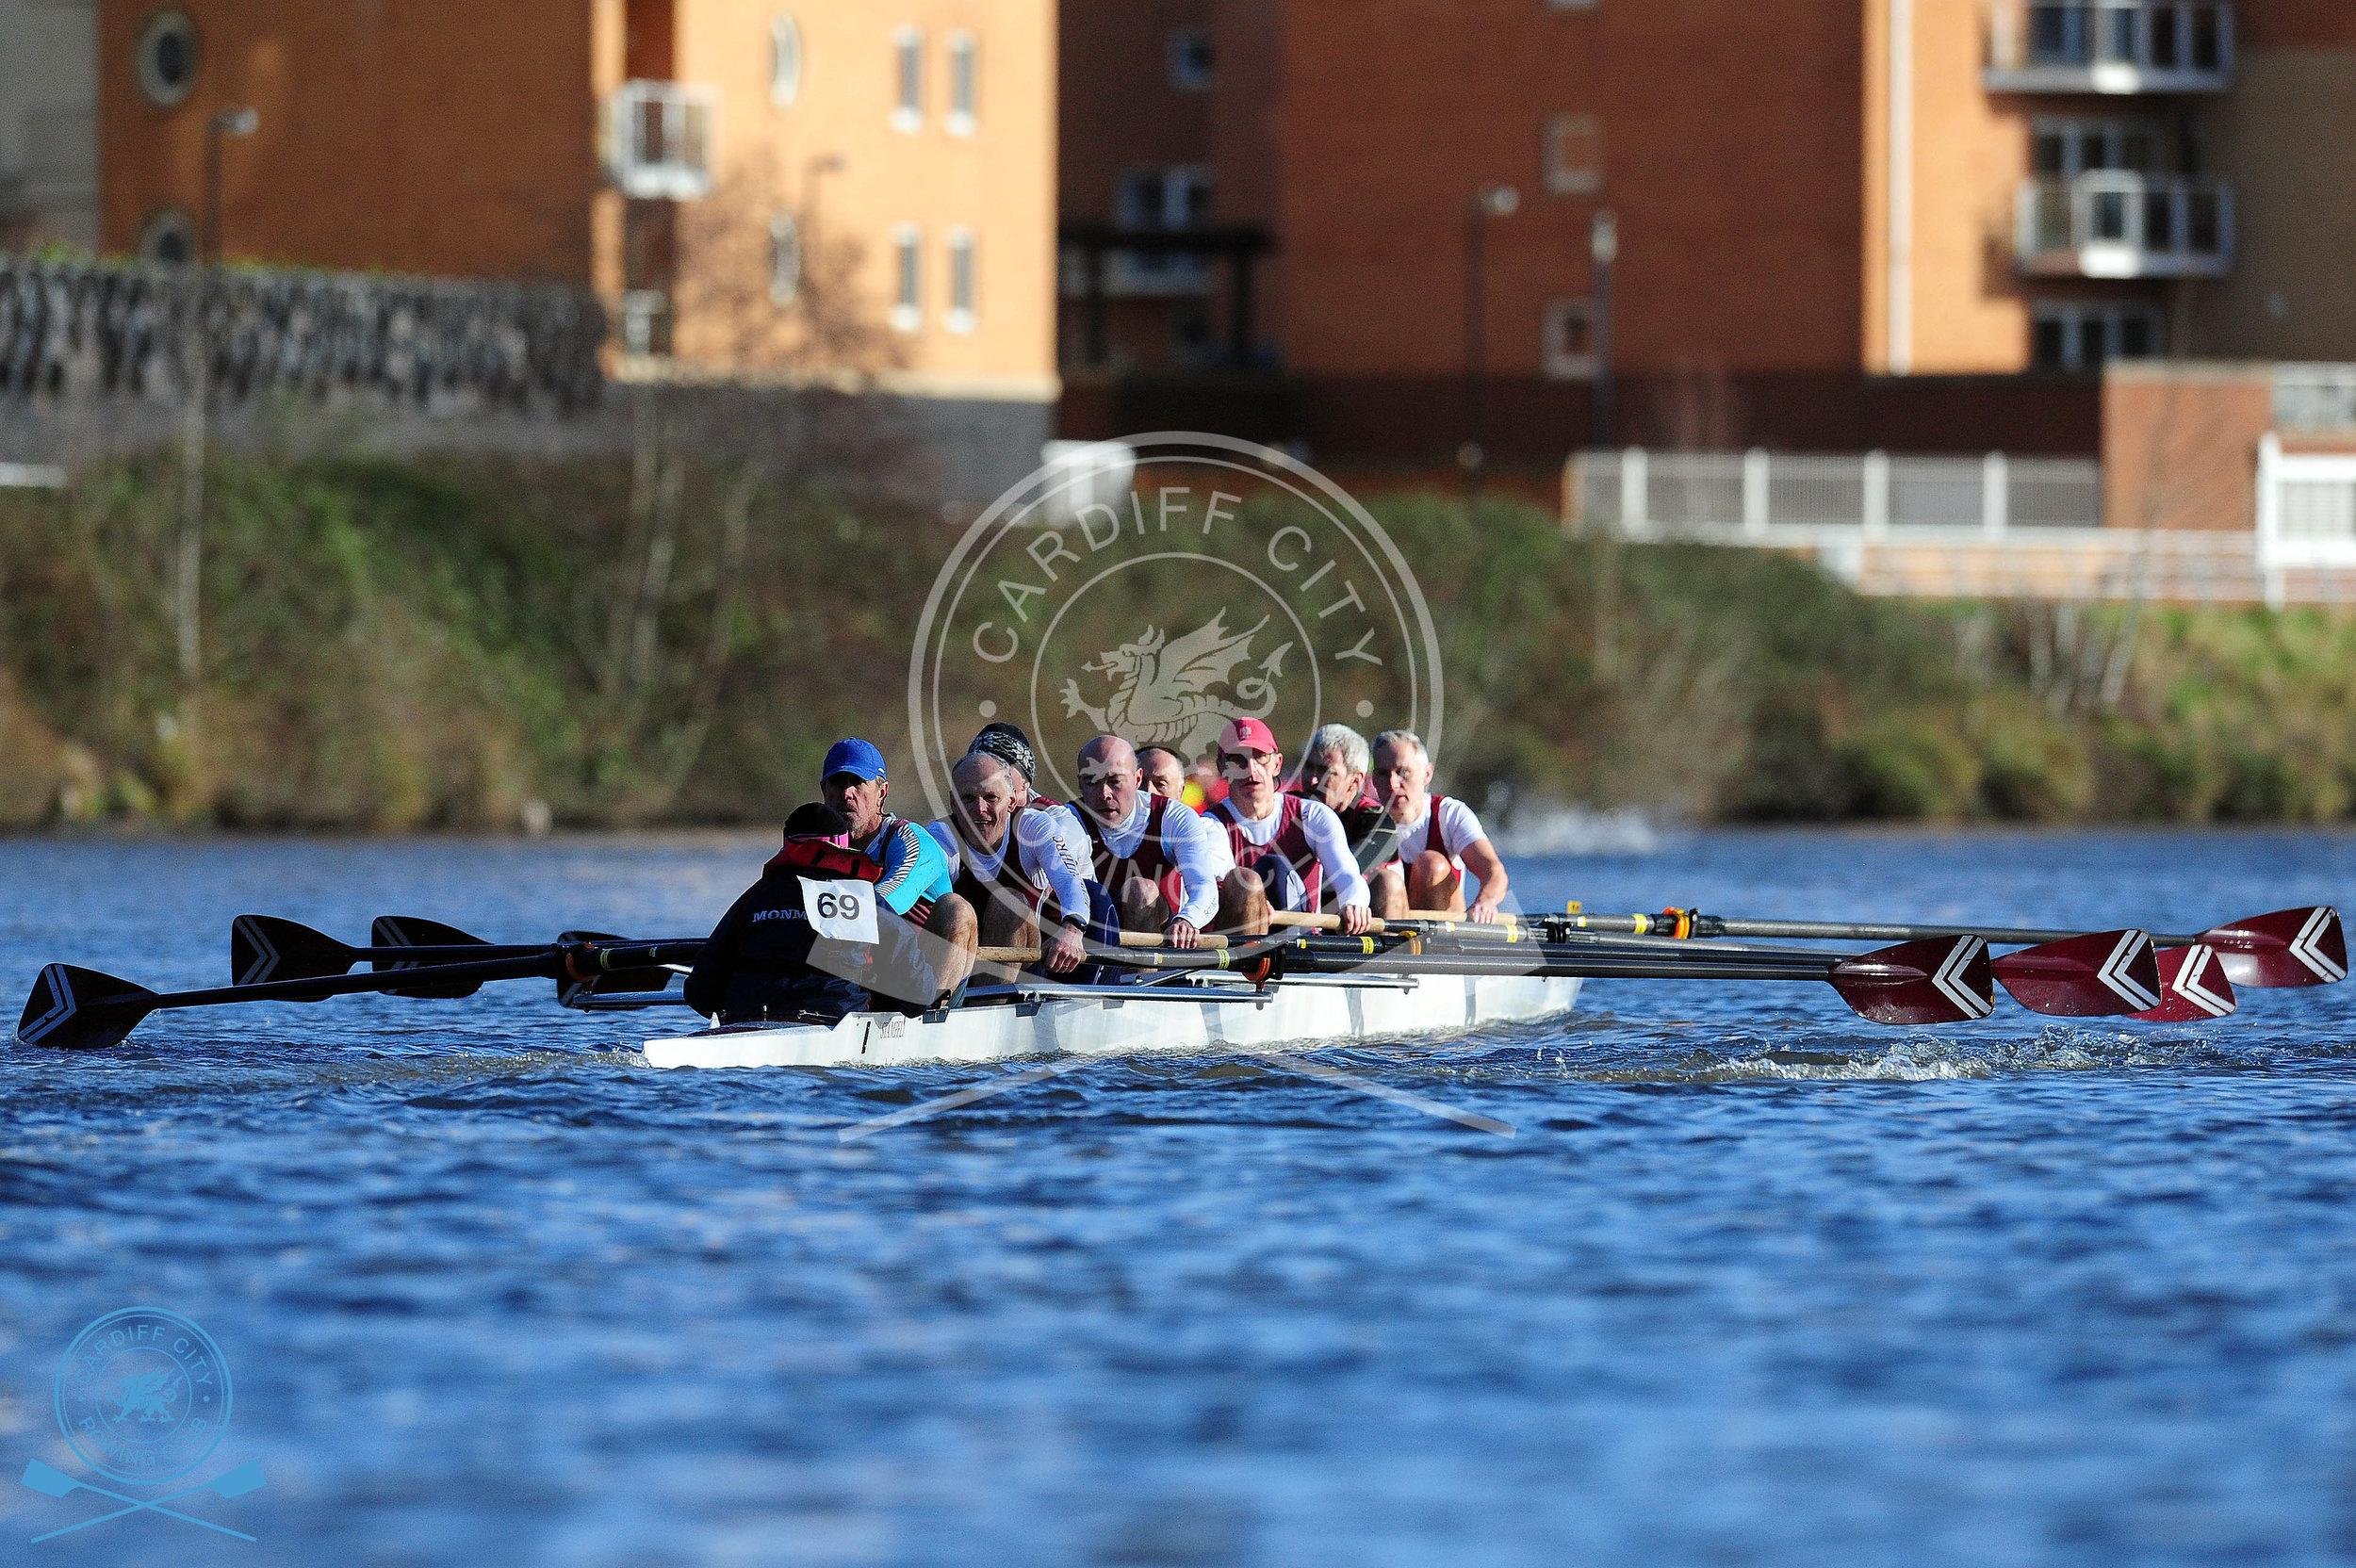 DW_280119_Cardiff_City_Rowing_237.jpg